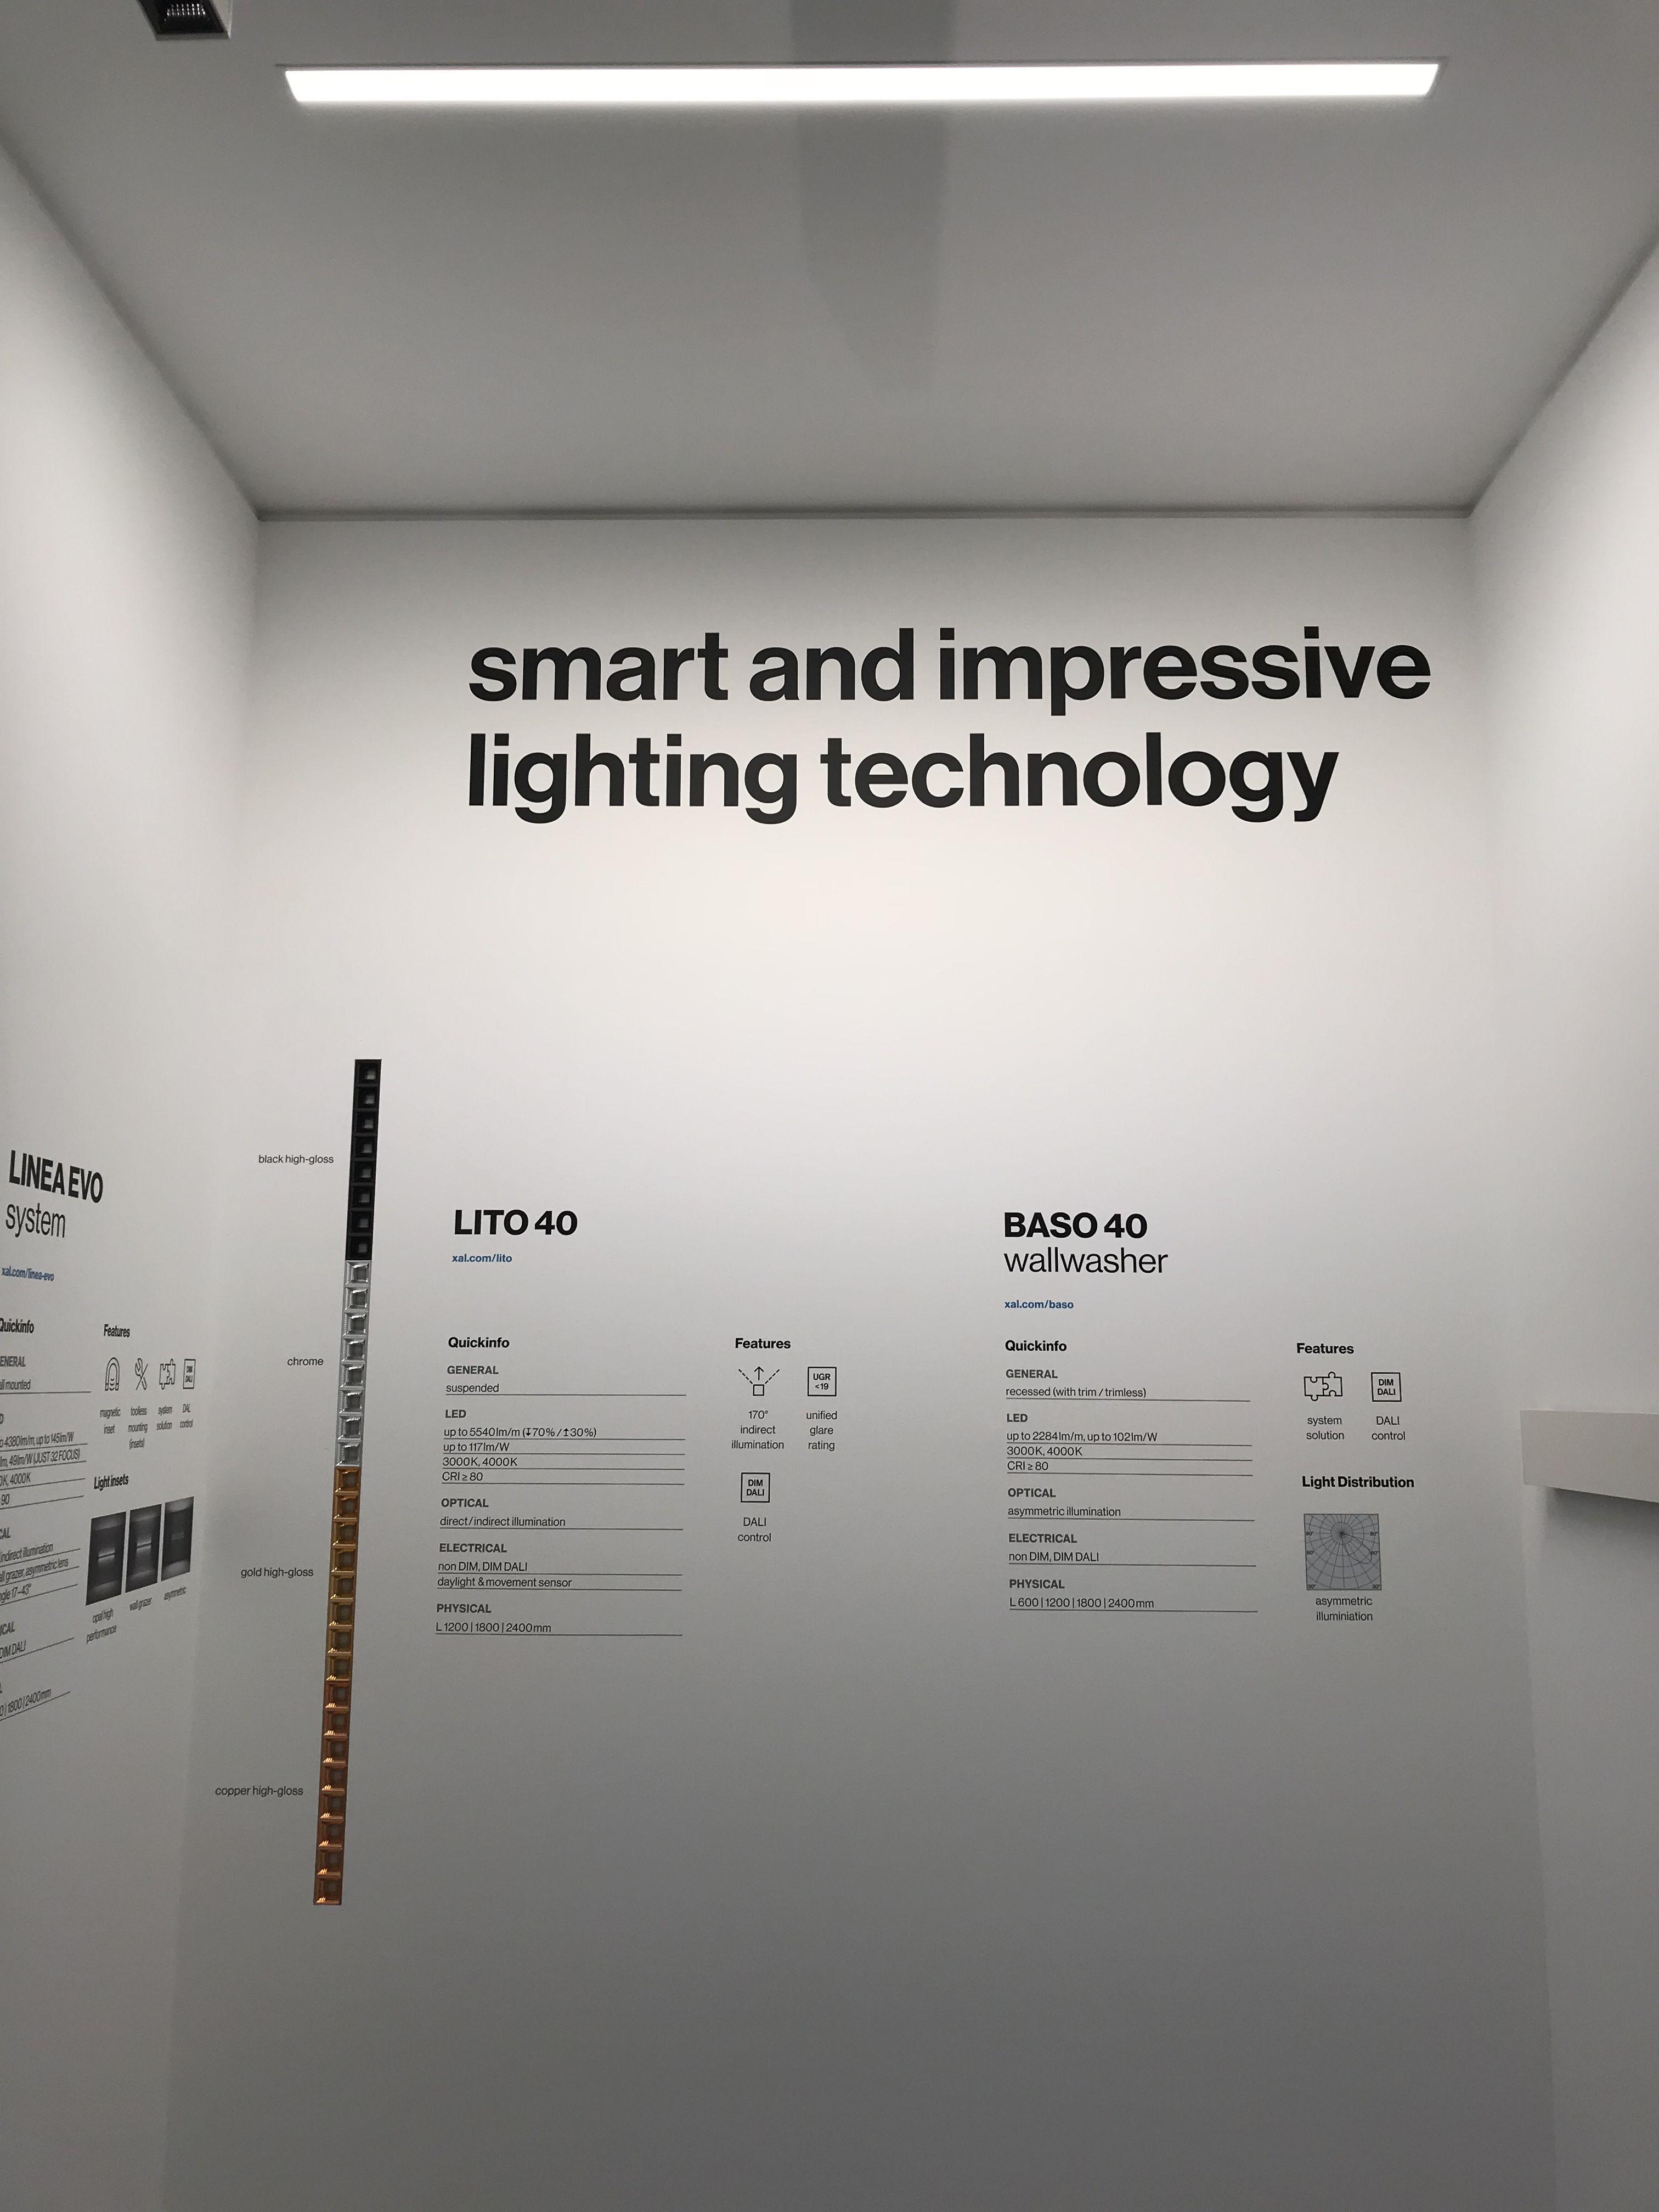 Xal Baso 40 Wallwash Products Led Lighting Solutions